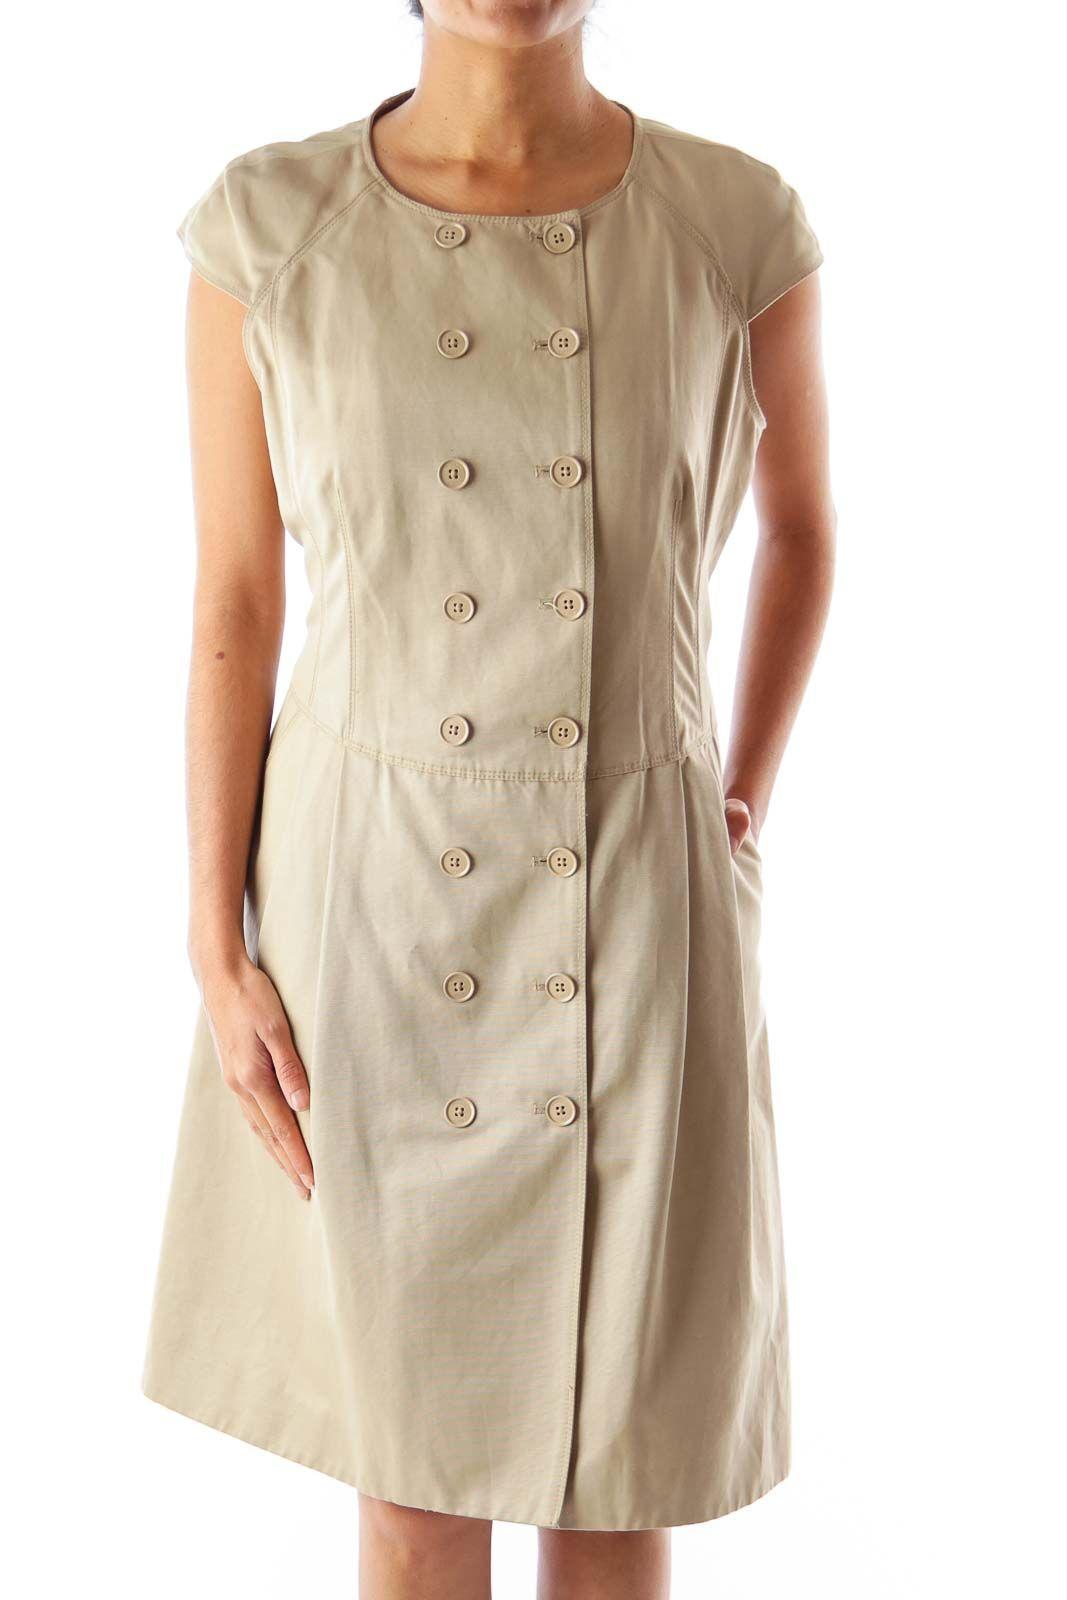 ab2487642f3 Like this Michael Kors dress? Shop this without using money! Trade. Shop.  Discover. #fashionexchange #prelovedfashion Khaki Button Up Dress by Michael  Kors